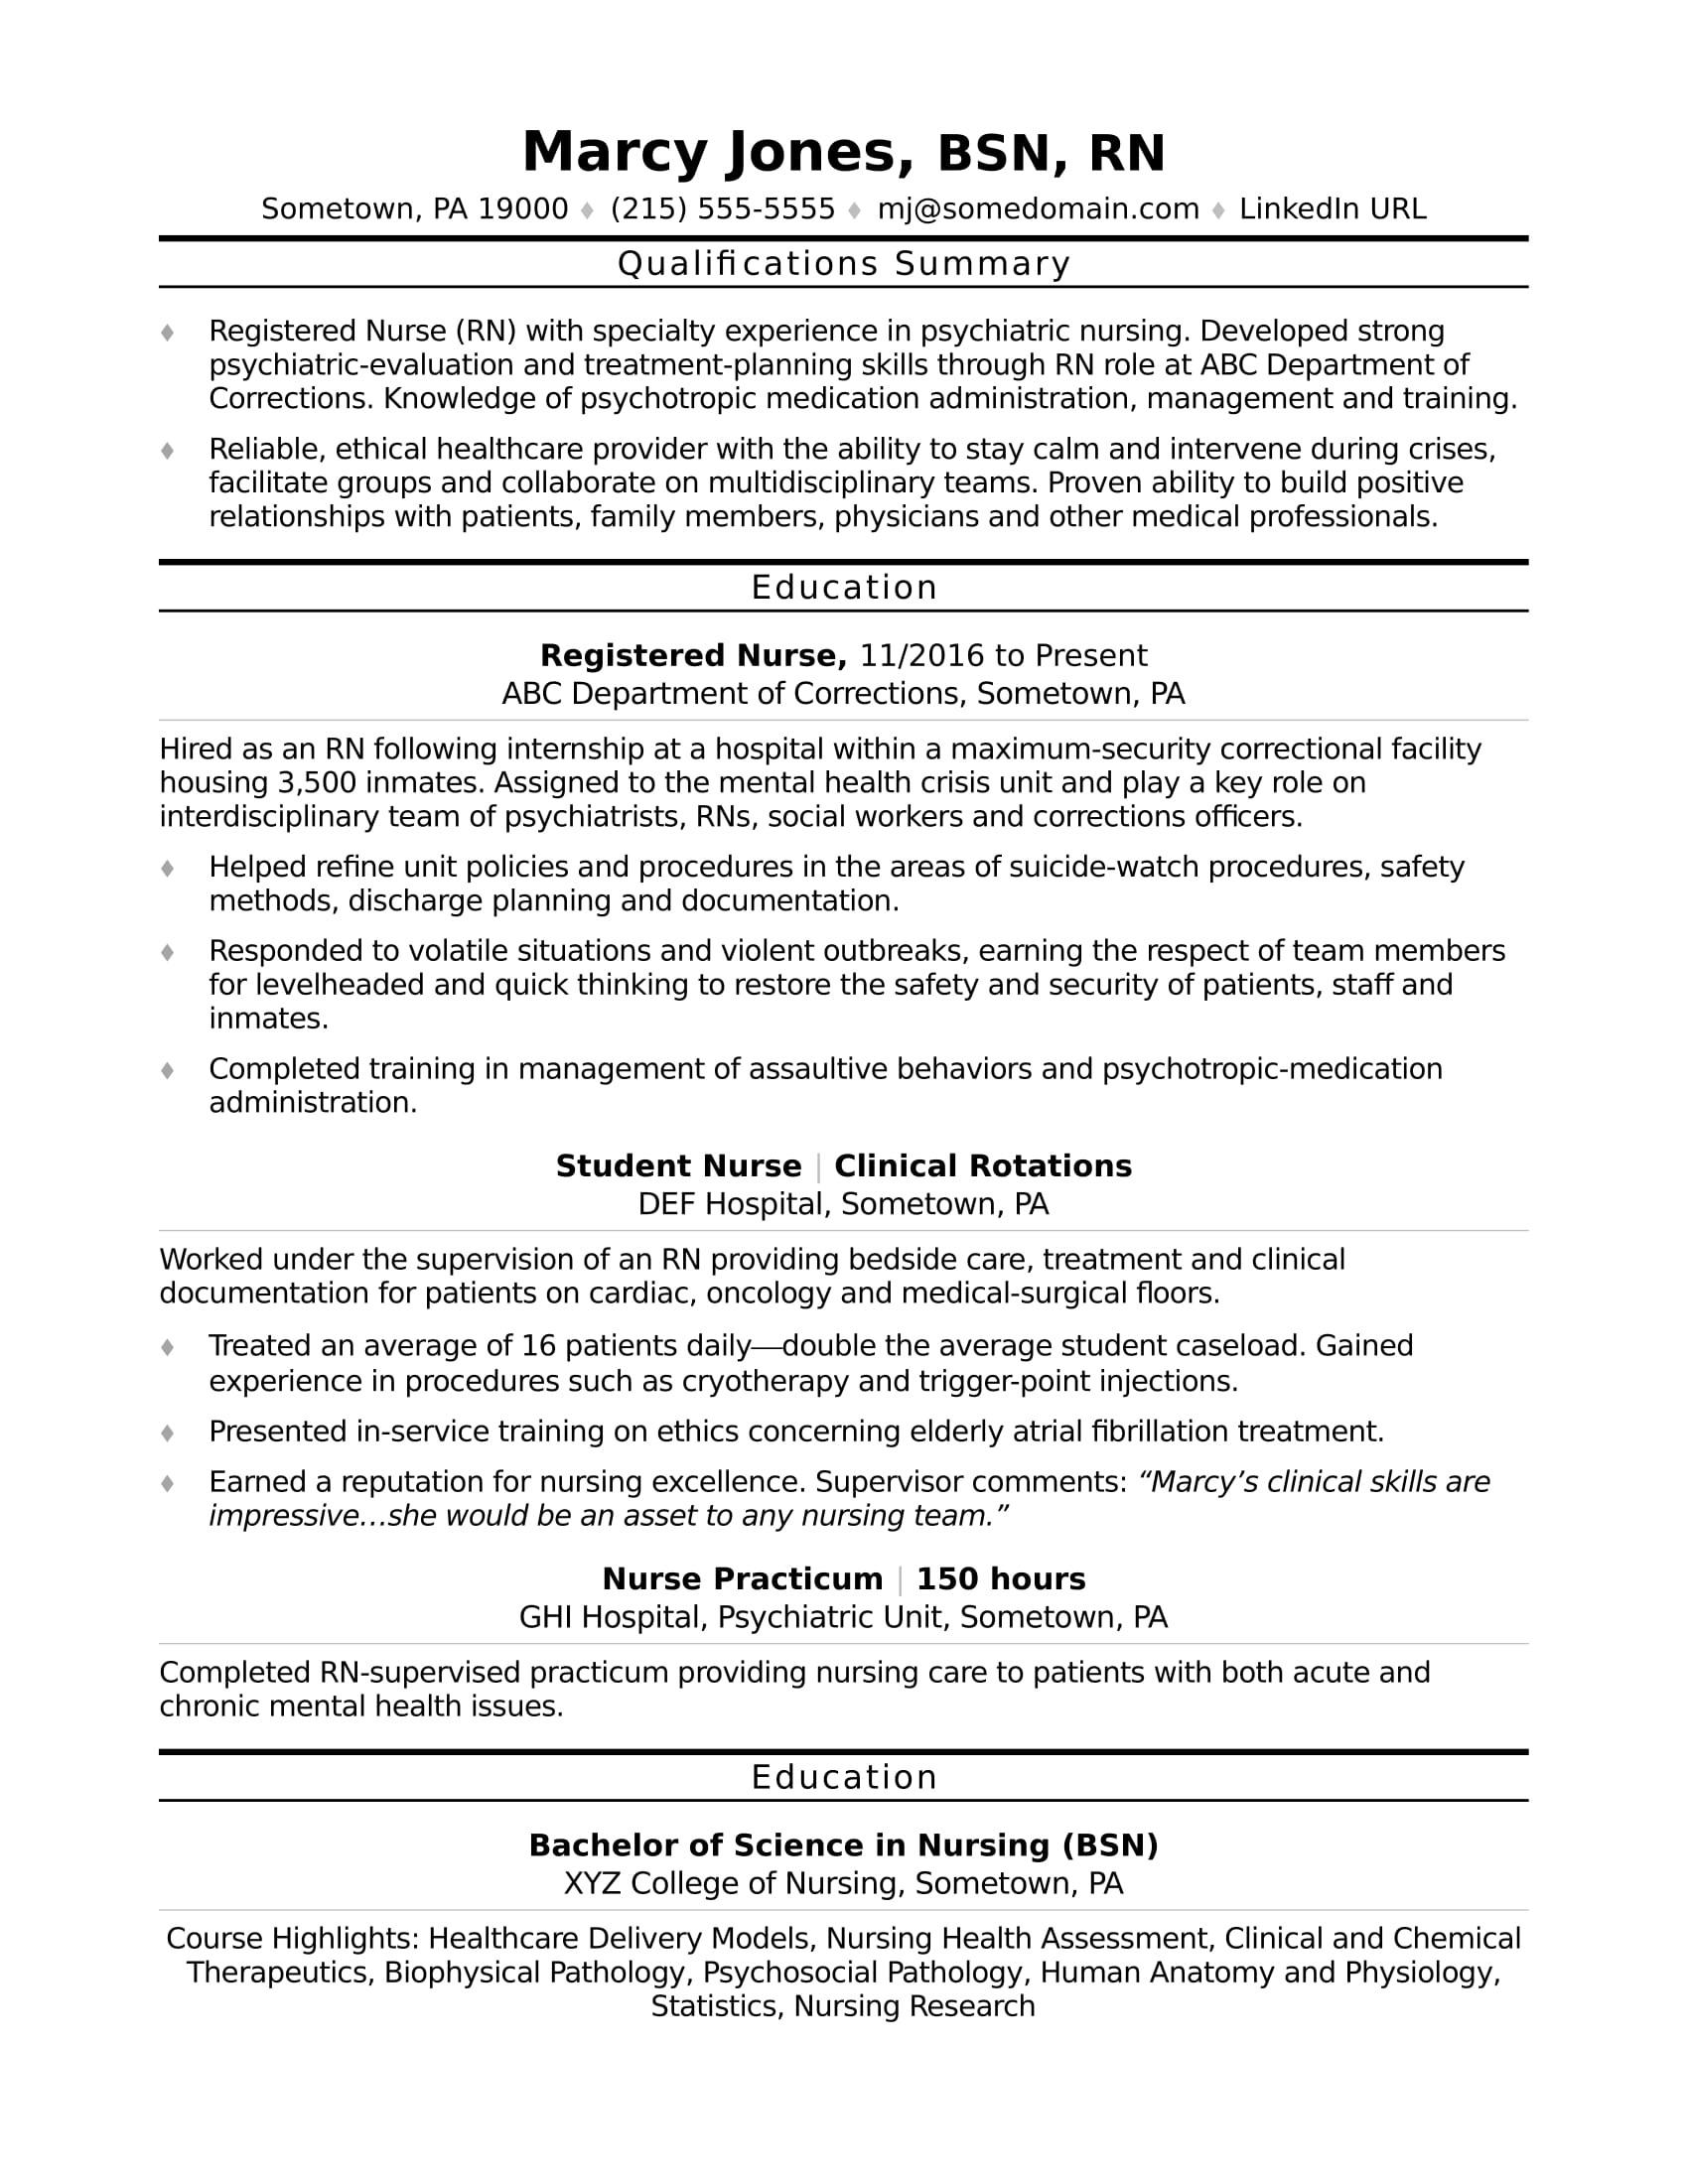 Resume Templates For Experienced Nurses